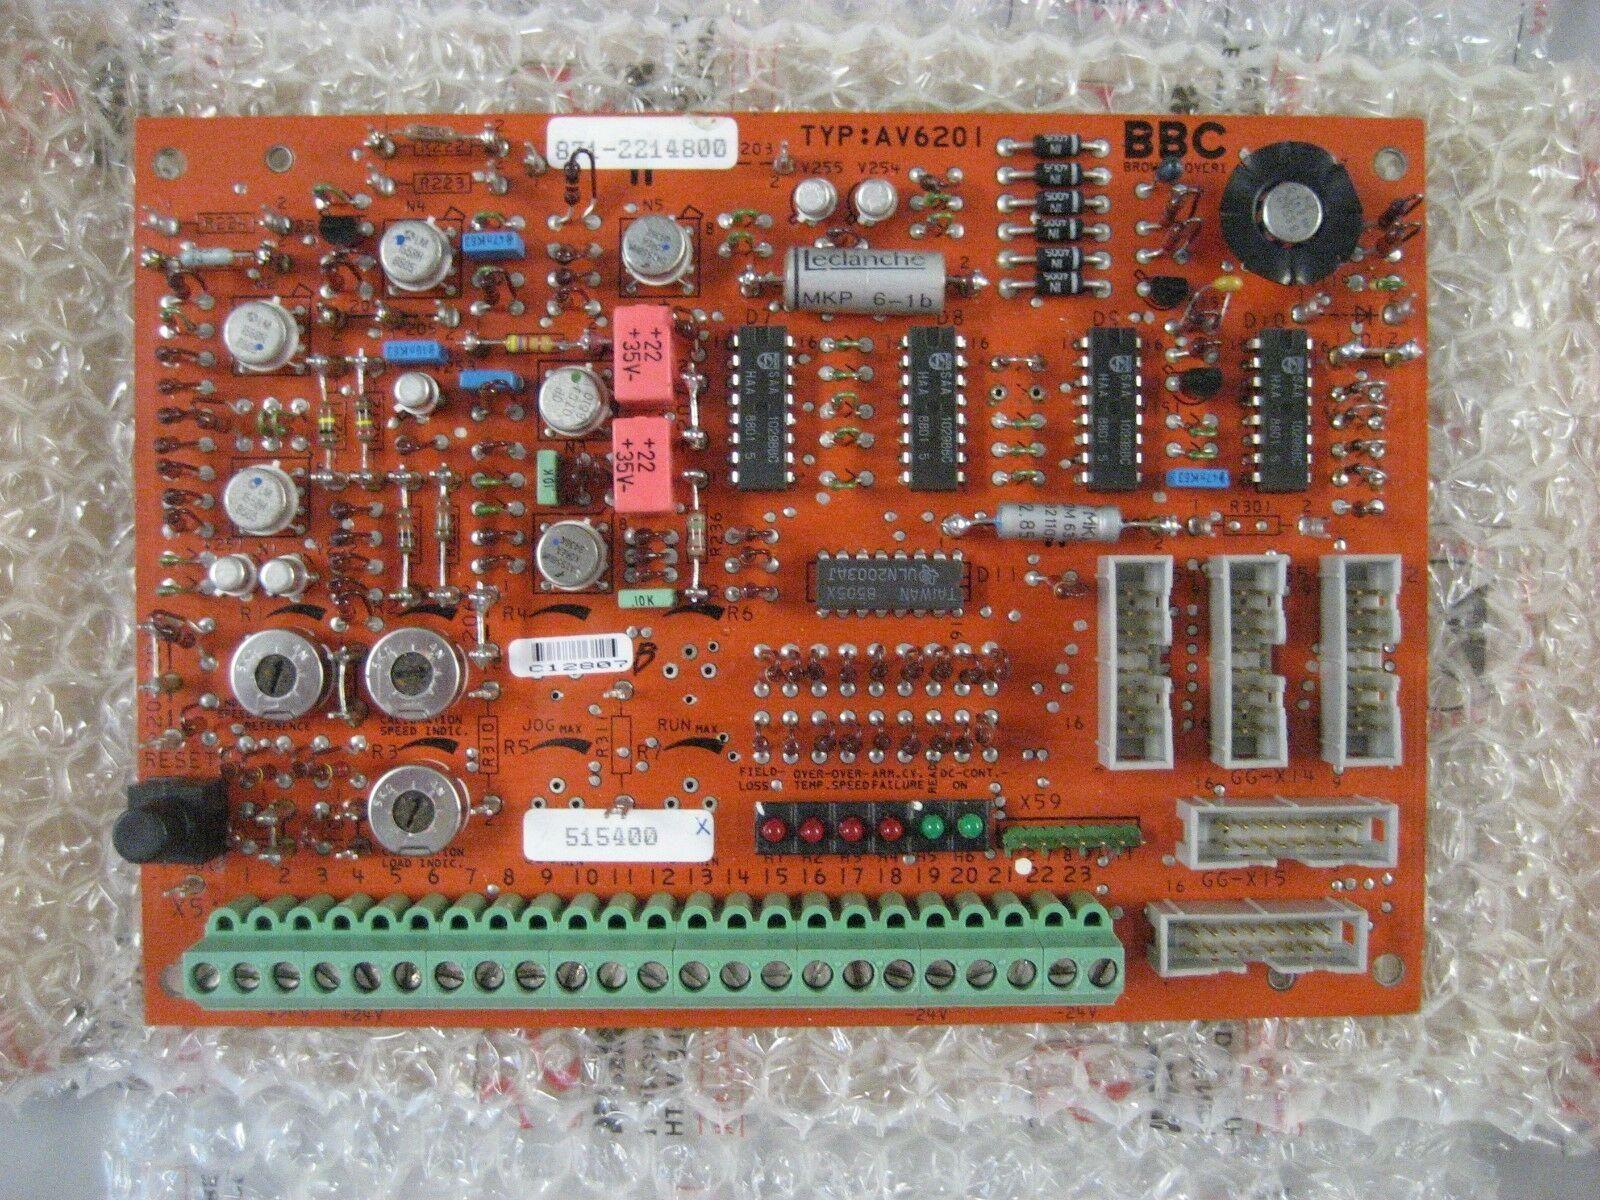 BBC AV6201 REGULATOR PC CIRCUIT BOARD - FREE SHIPPING